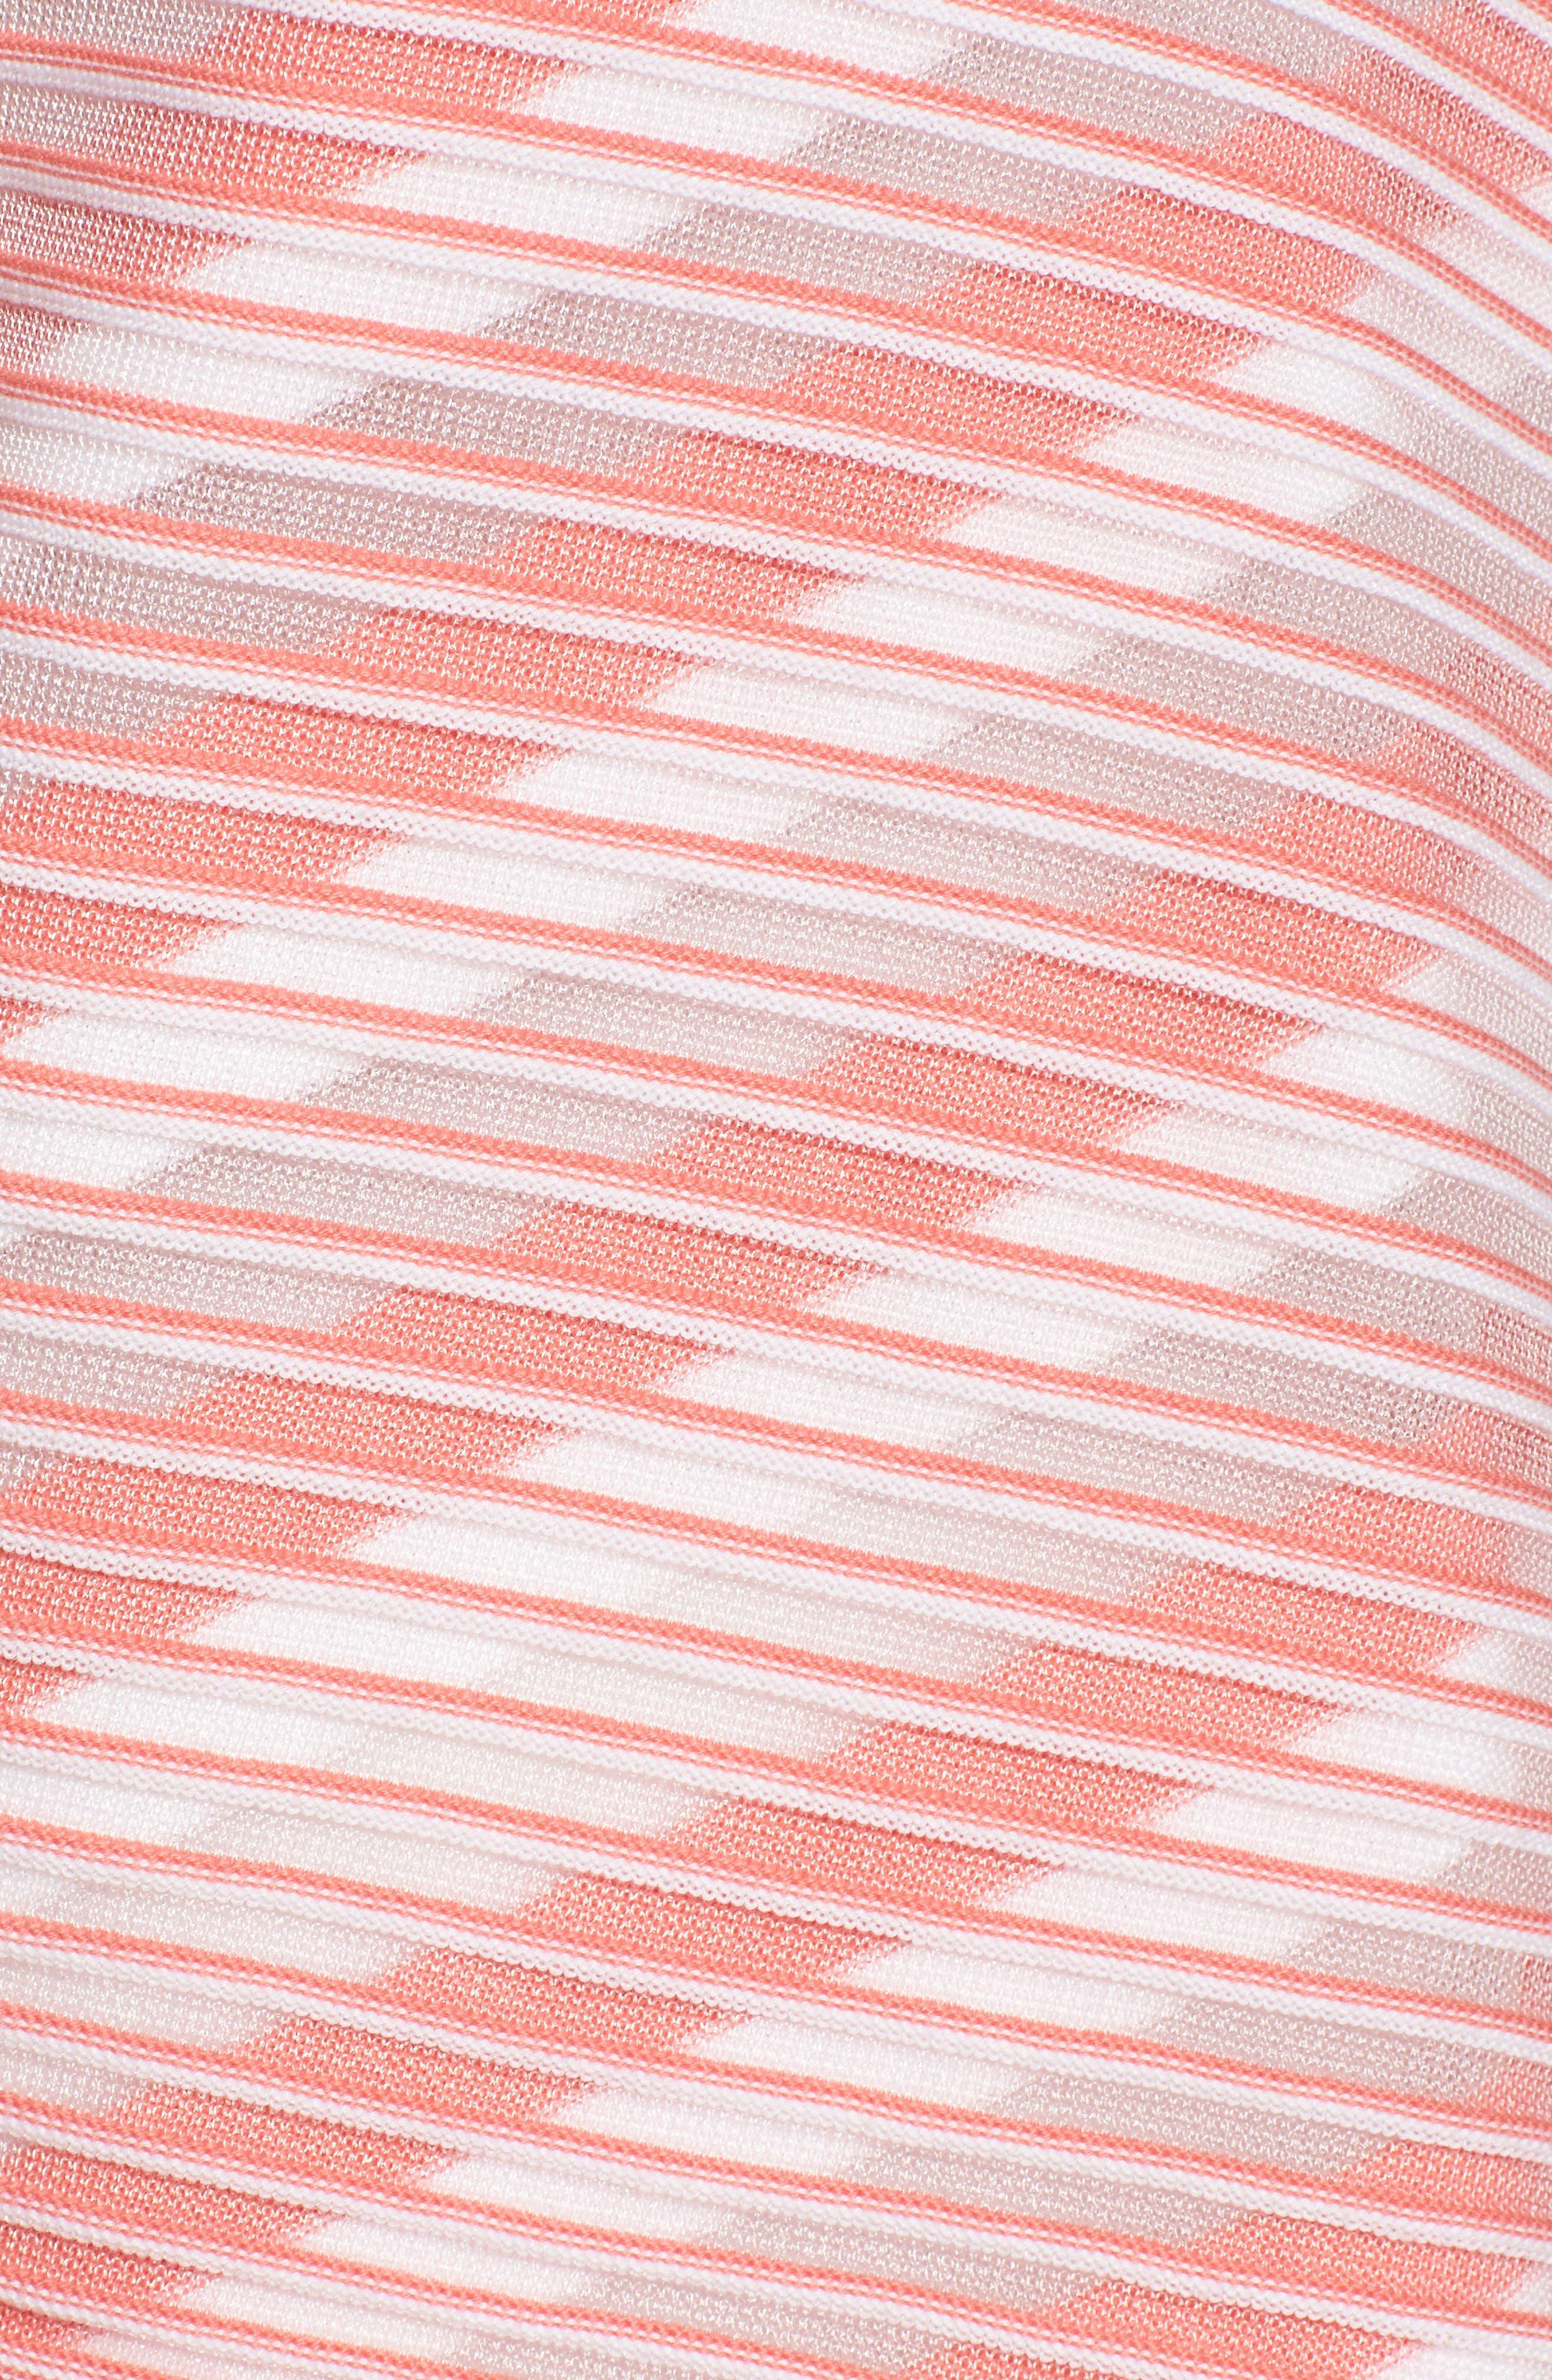 Sheer Stripe Knit Tunic,                             Alternate thumbnail 5, color,                             Daylily/ White